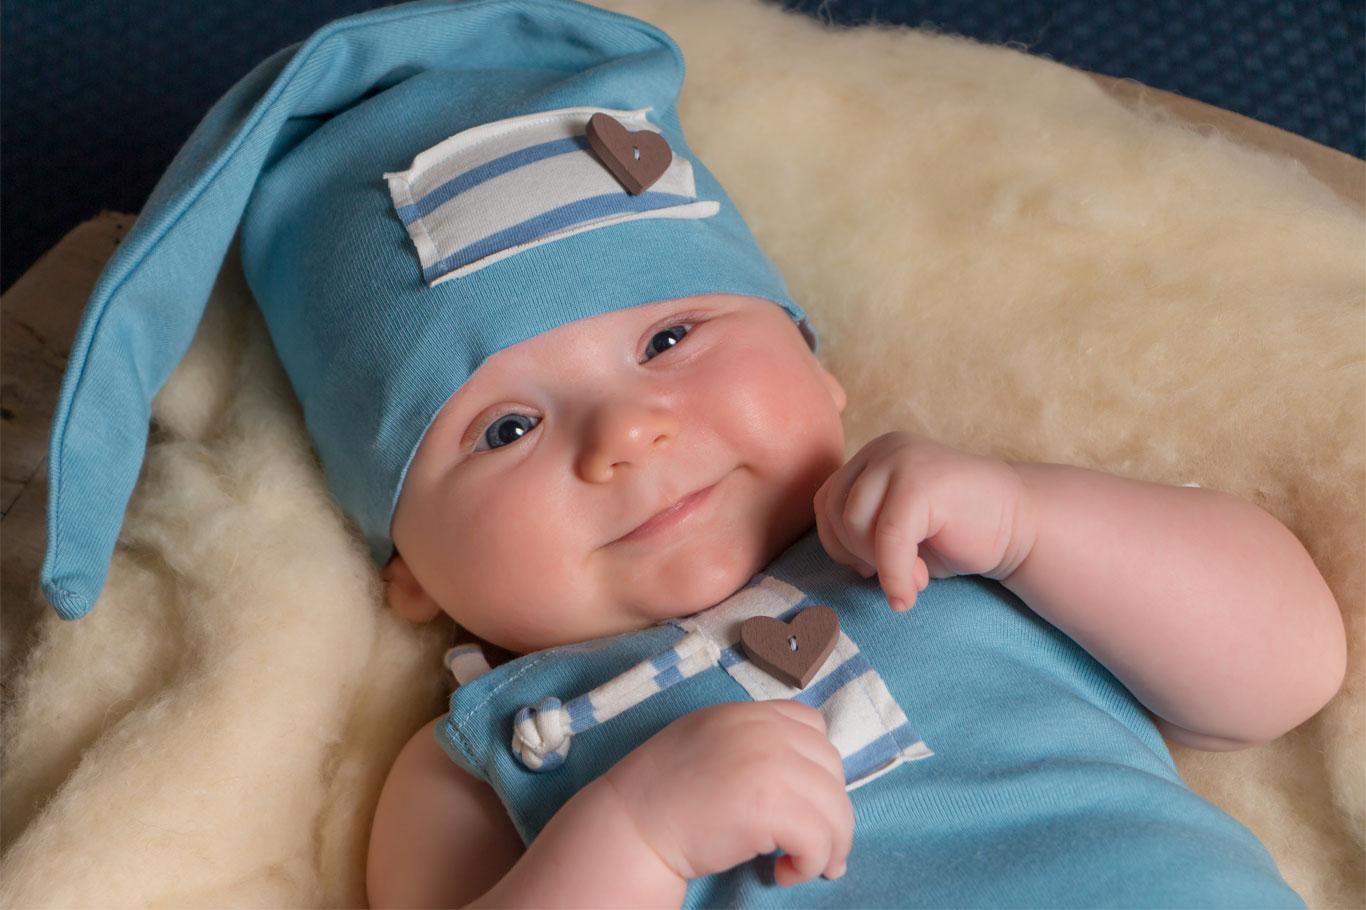 nasmejani novorođeni dečak u plavom kombinezonu sa plavom kapom